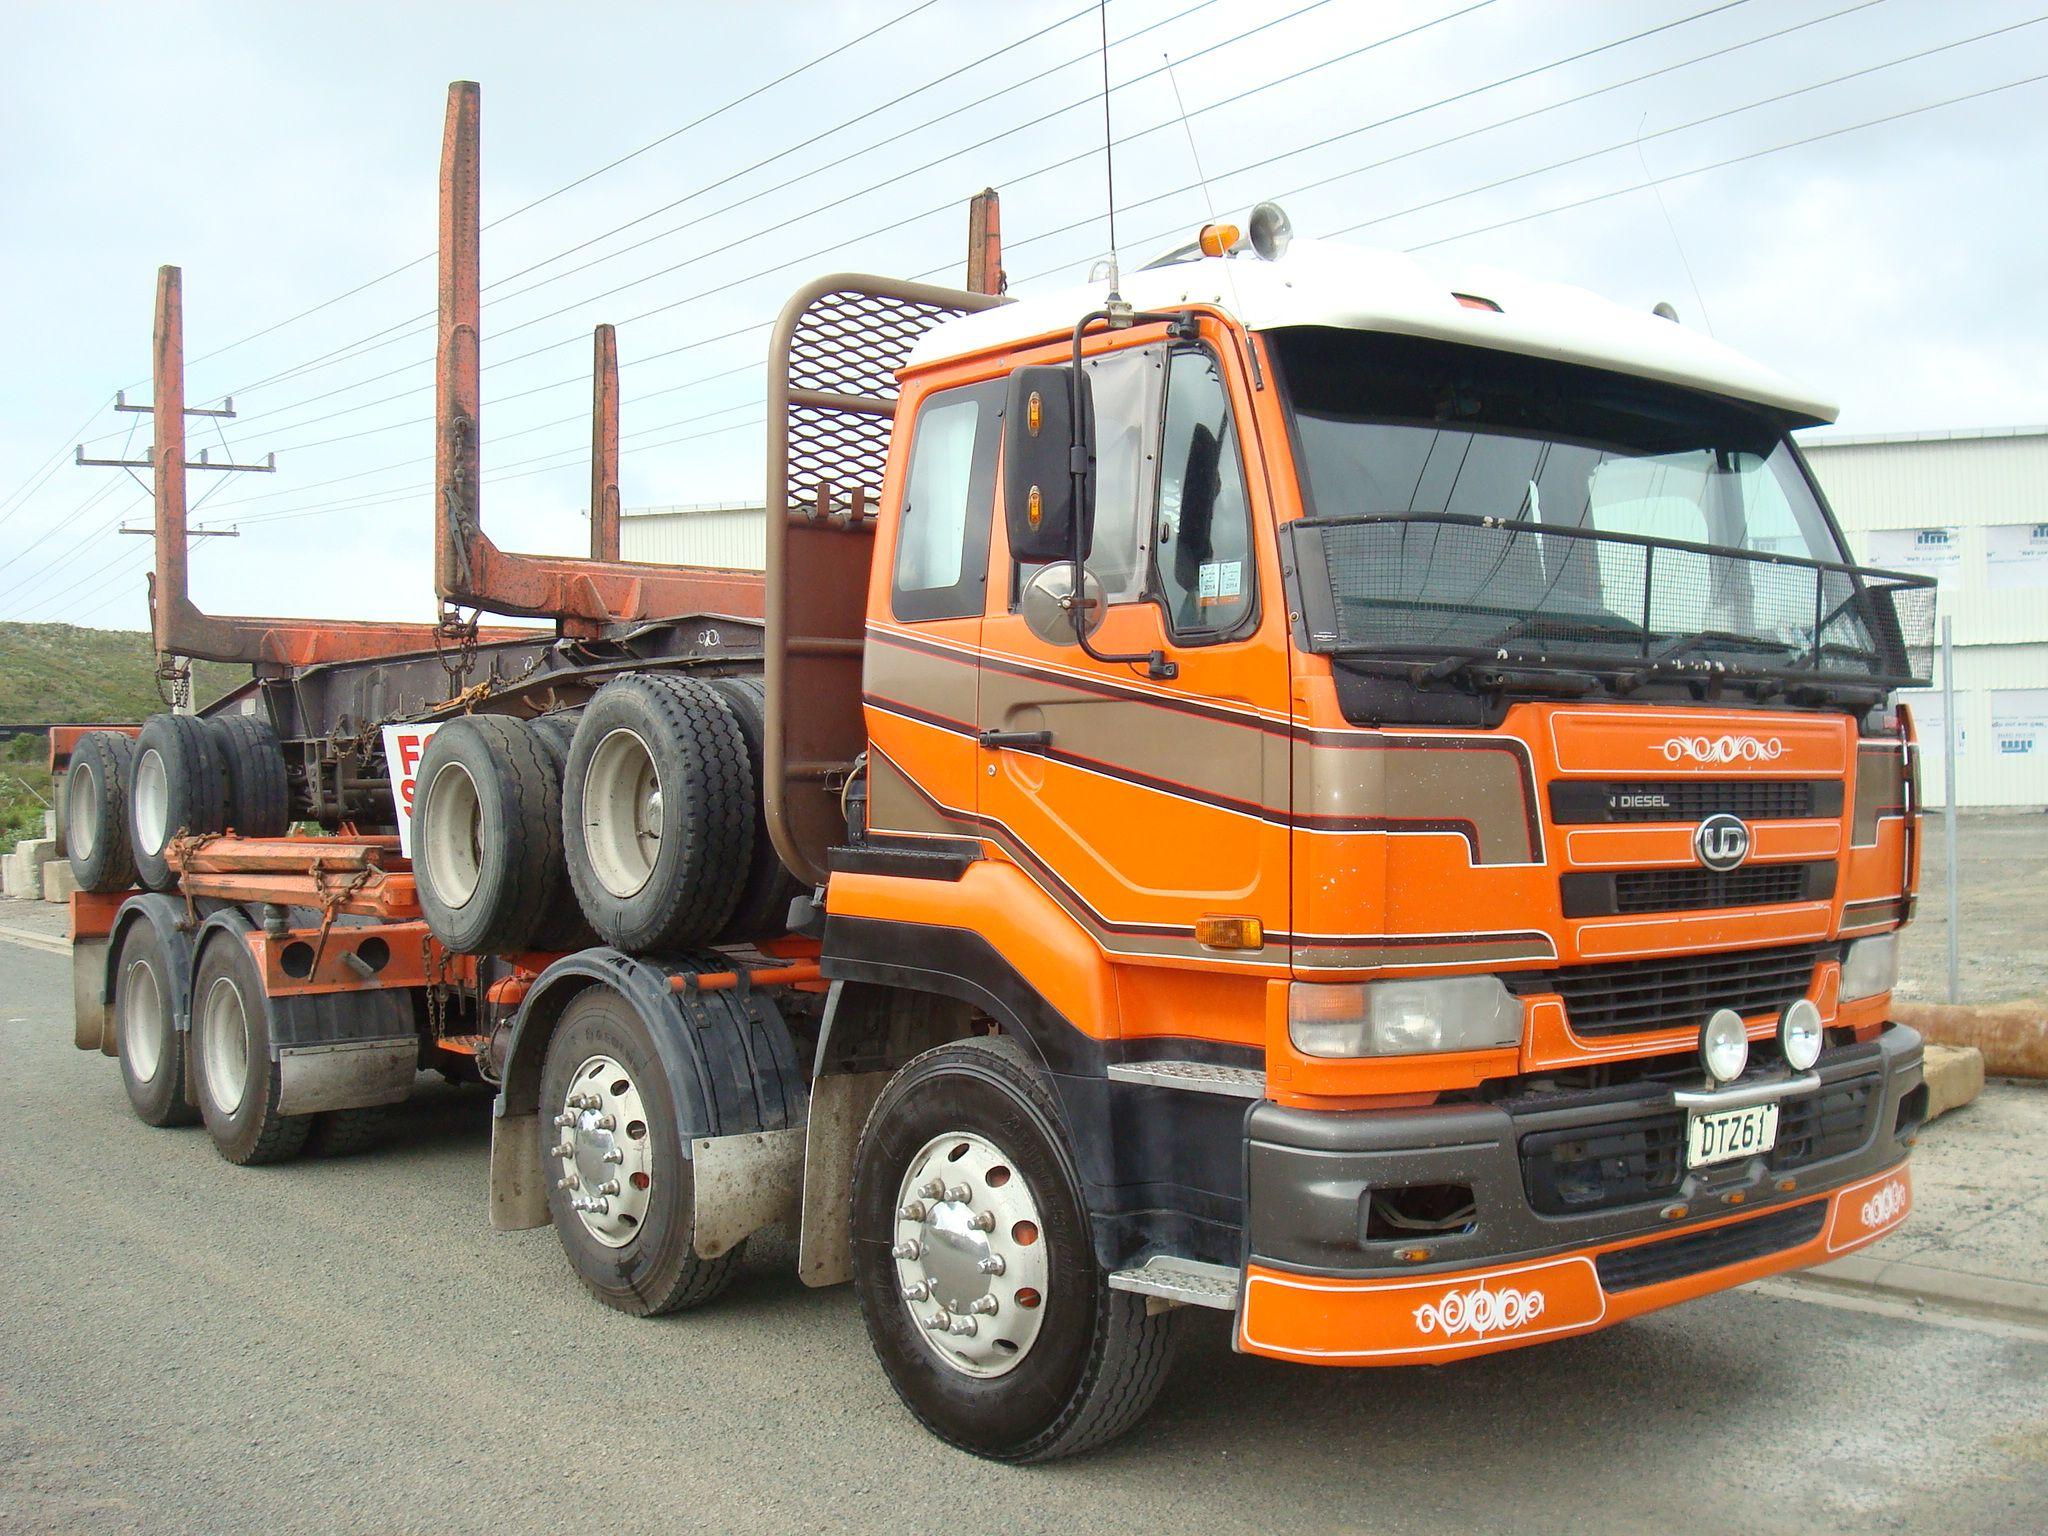 NISSAN UD | caminhões | Pinterest | Nissan and Vehicle